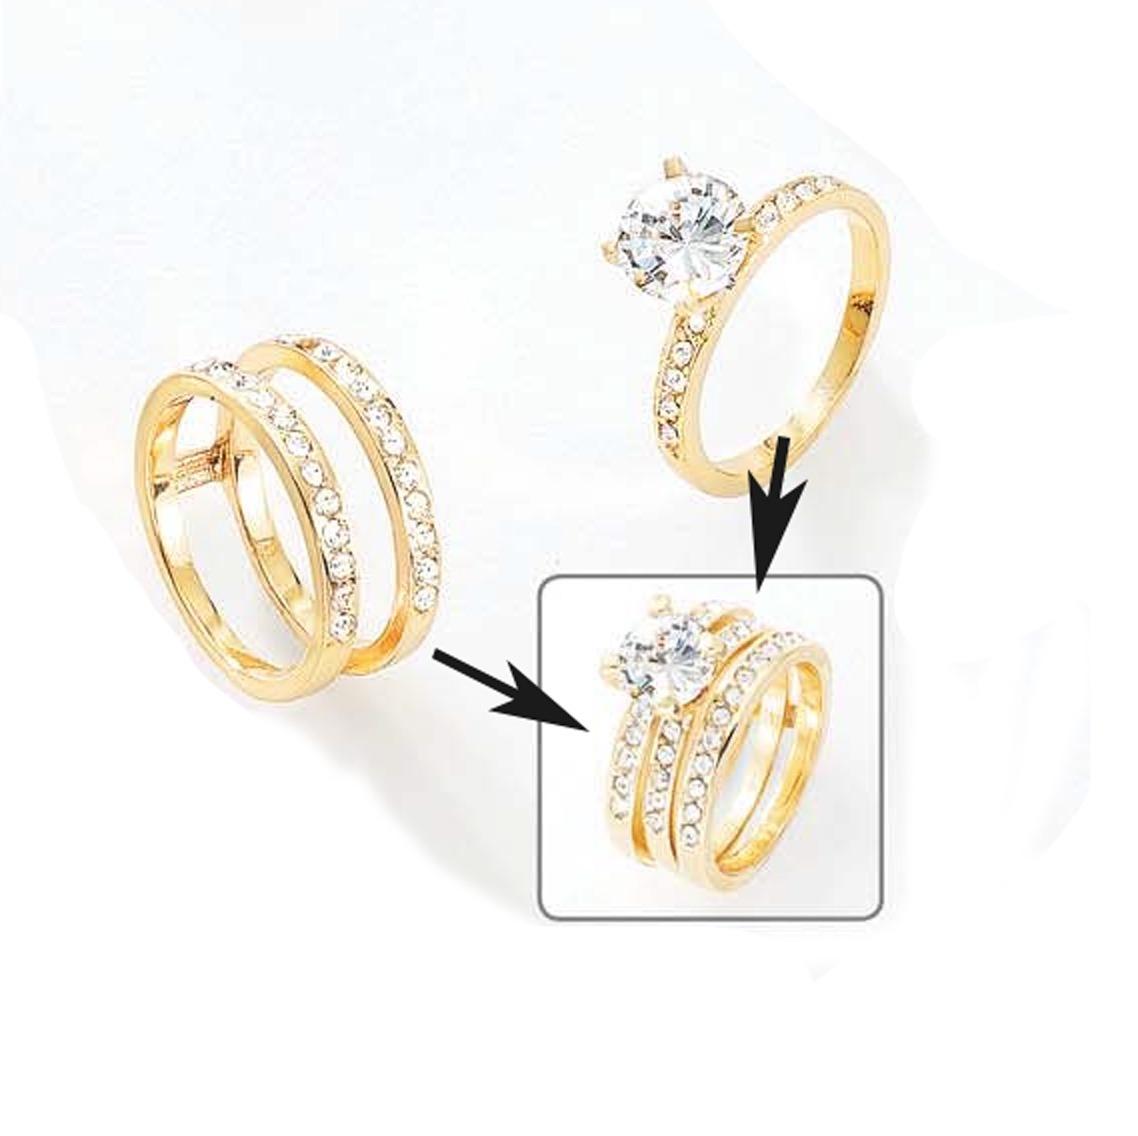 Juego anillos complementos dama ba o de oro 18k nice - Complementos de bano online ...